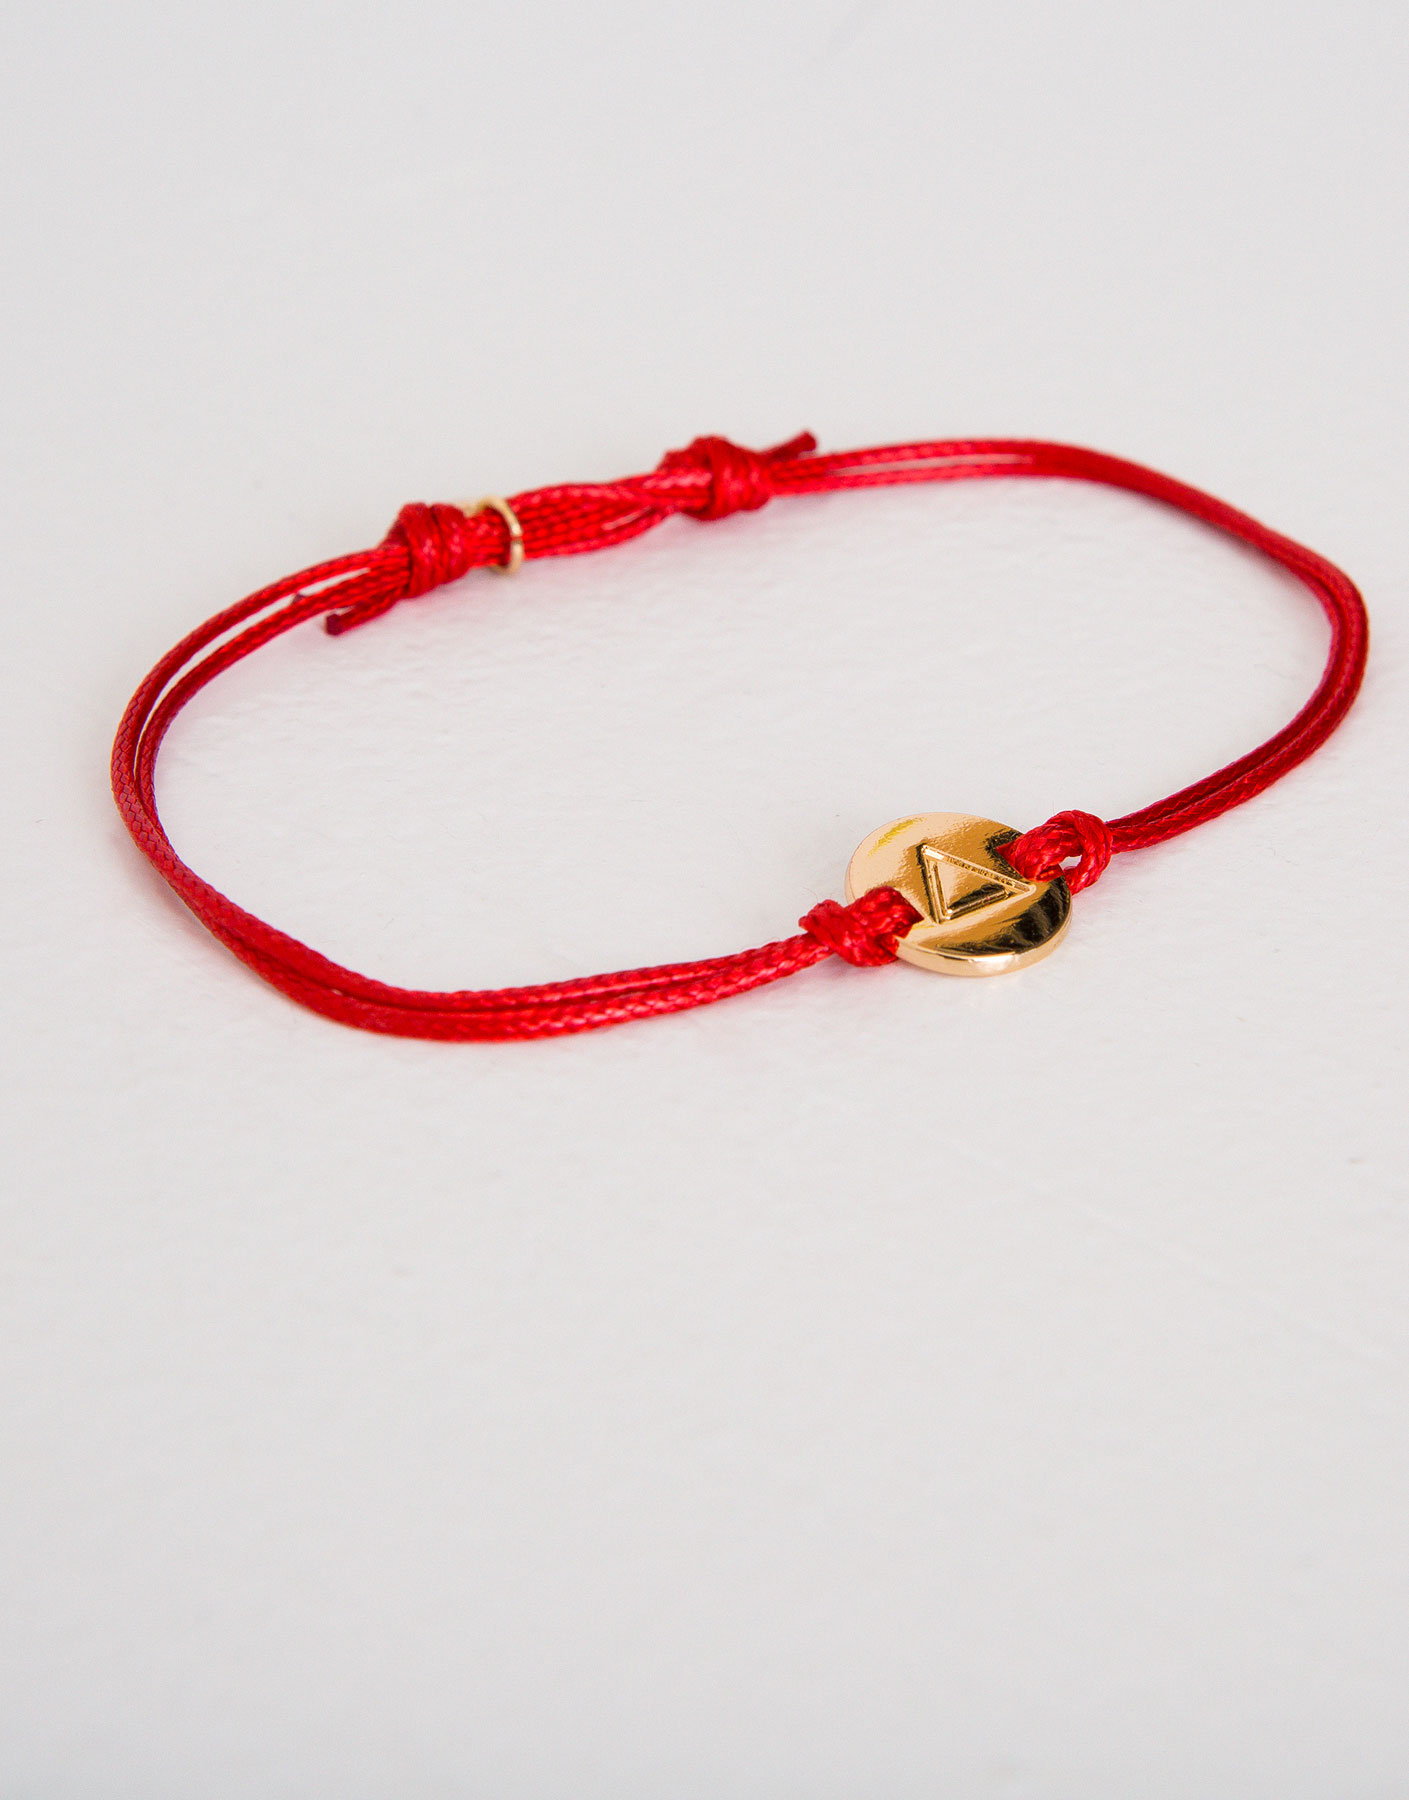 Zodiac fire bracelet